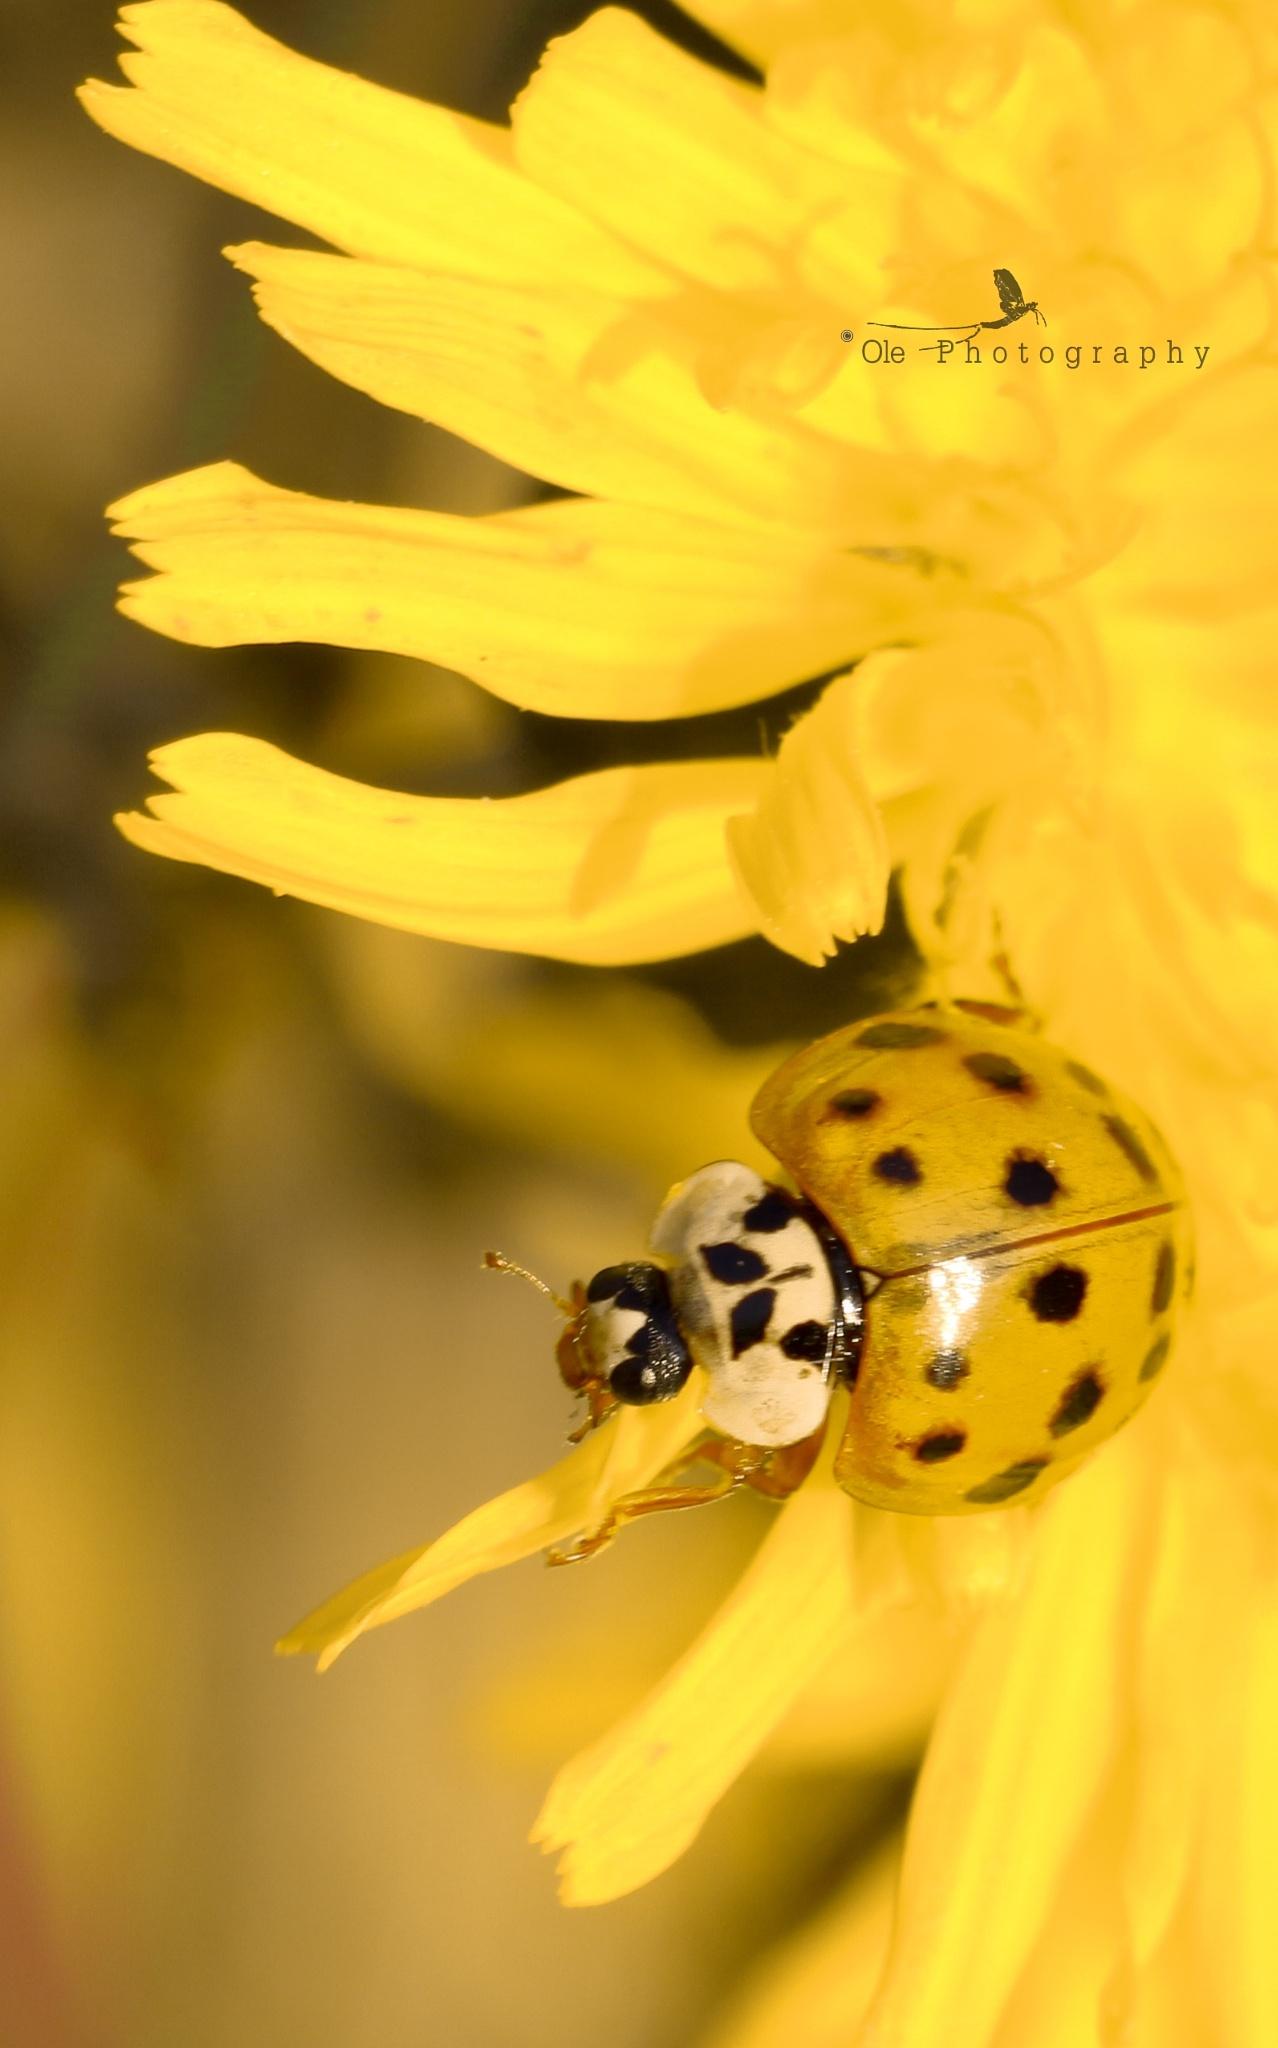 Yelow ladybug by OlePhotography